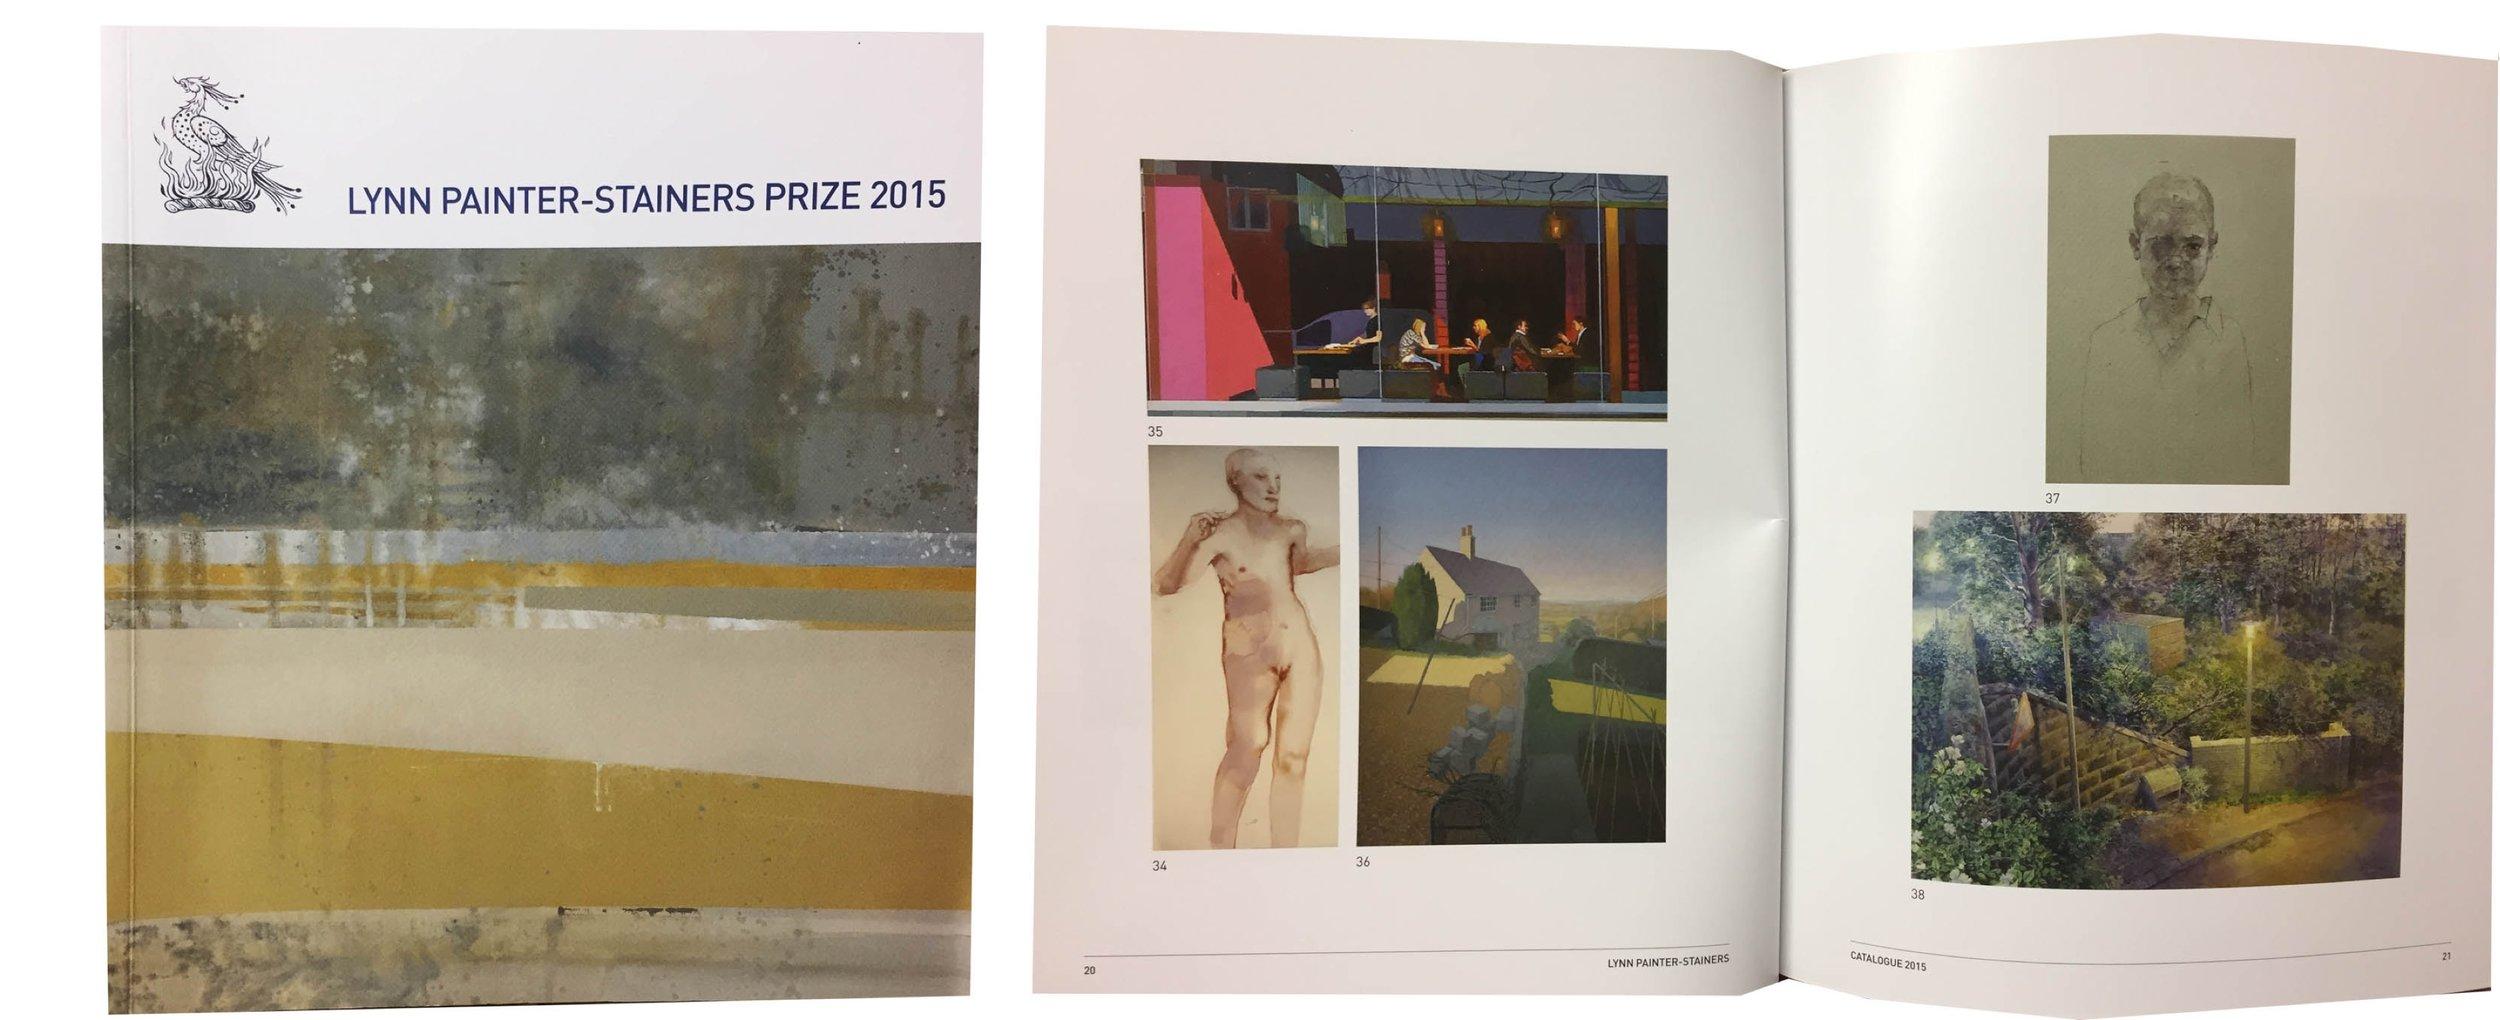 catalogs 2-3.jpg